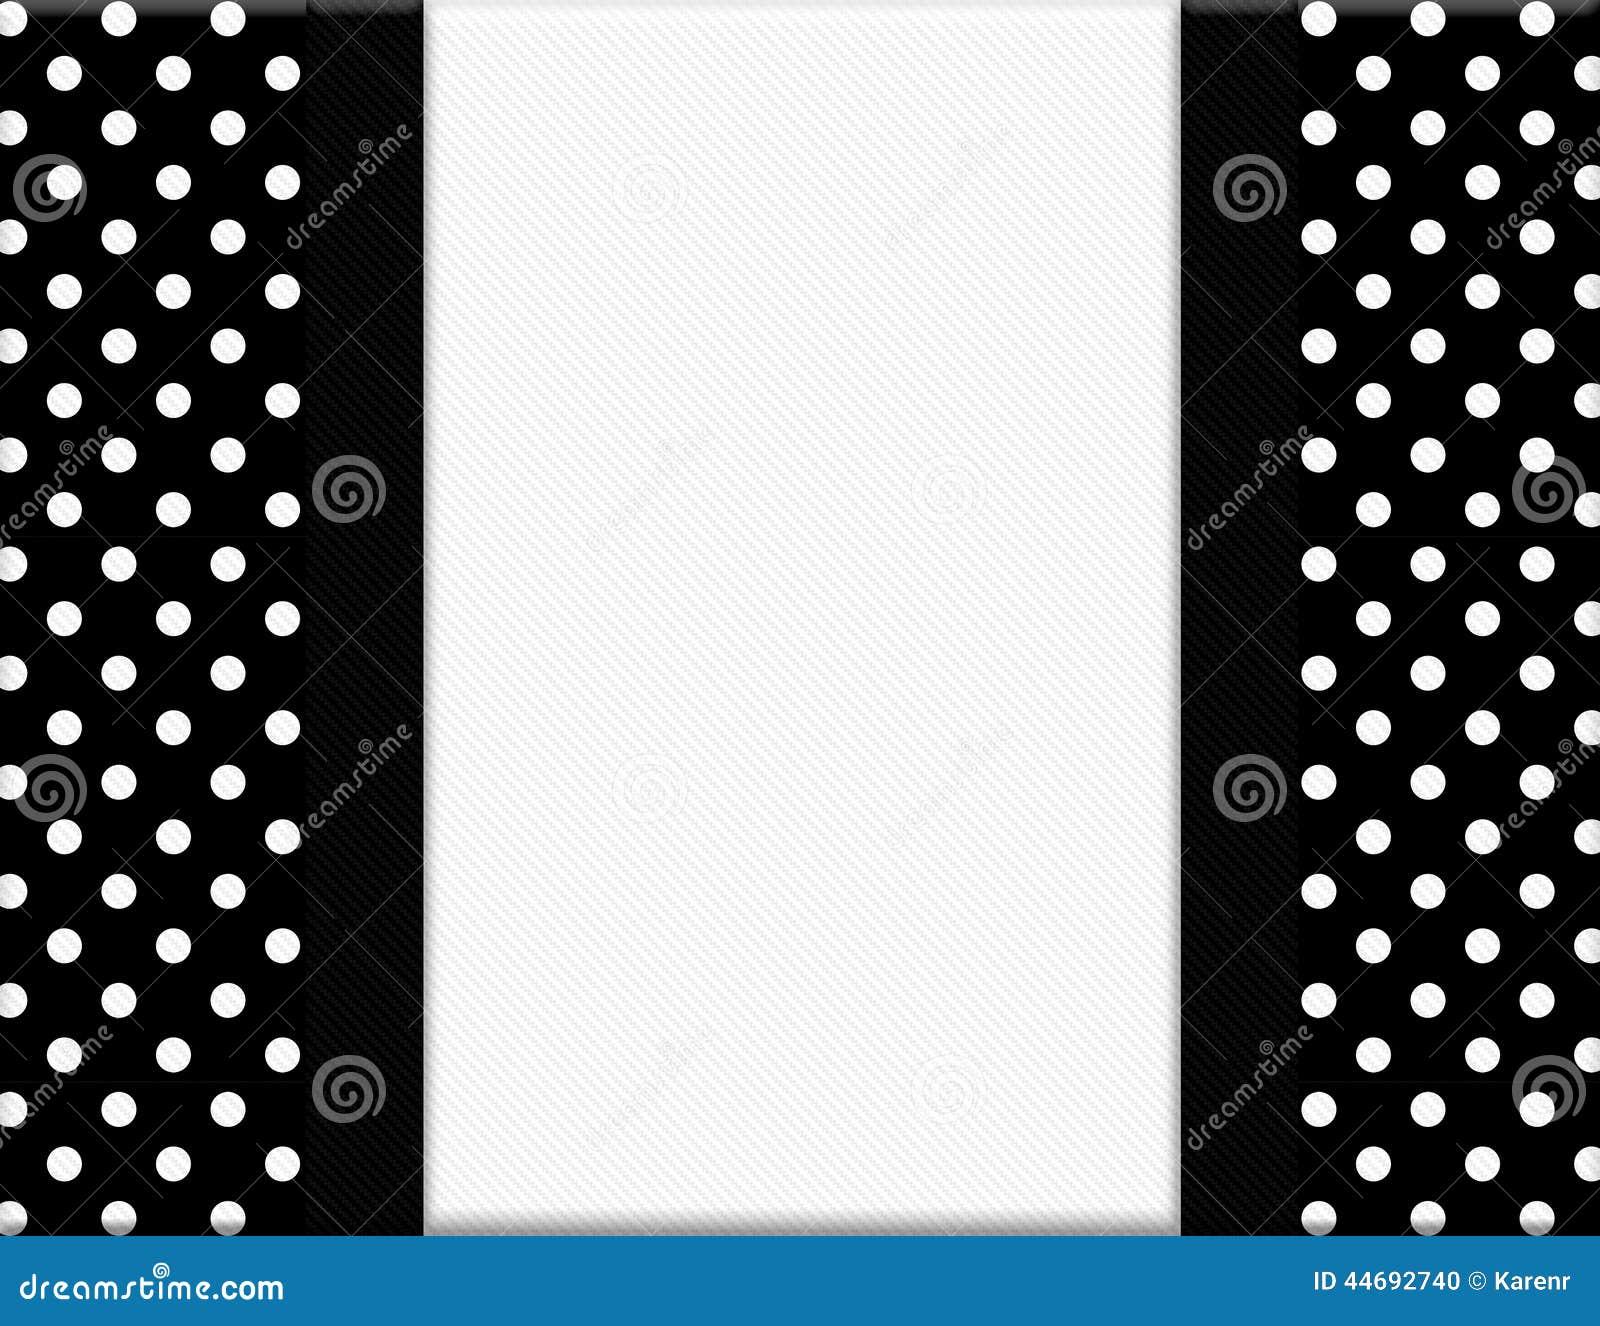 Black And White Polka Dot Frame With Ribbon Background Stock Photo ...